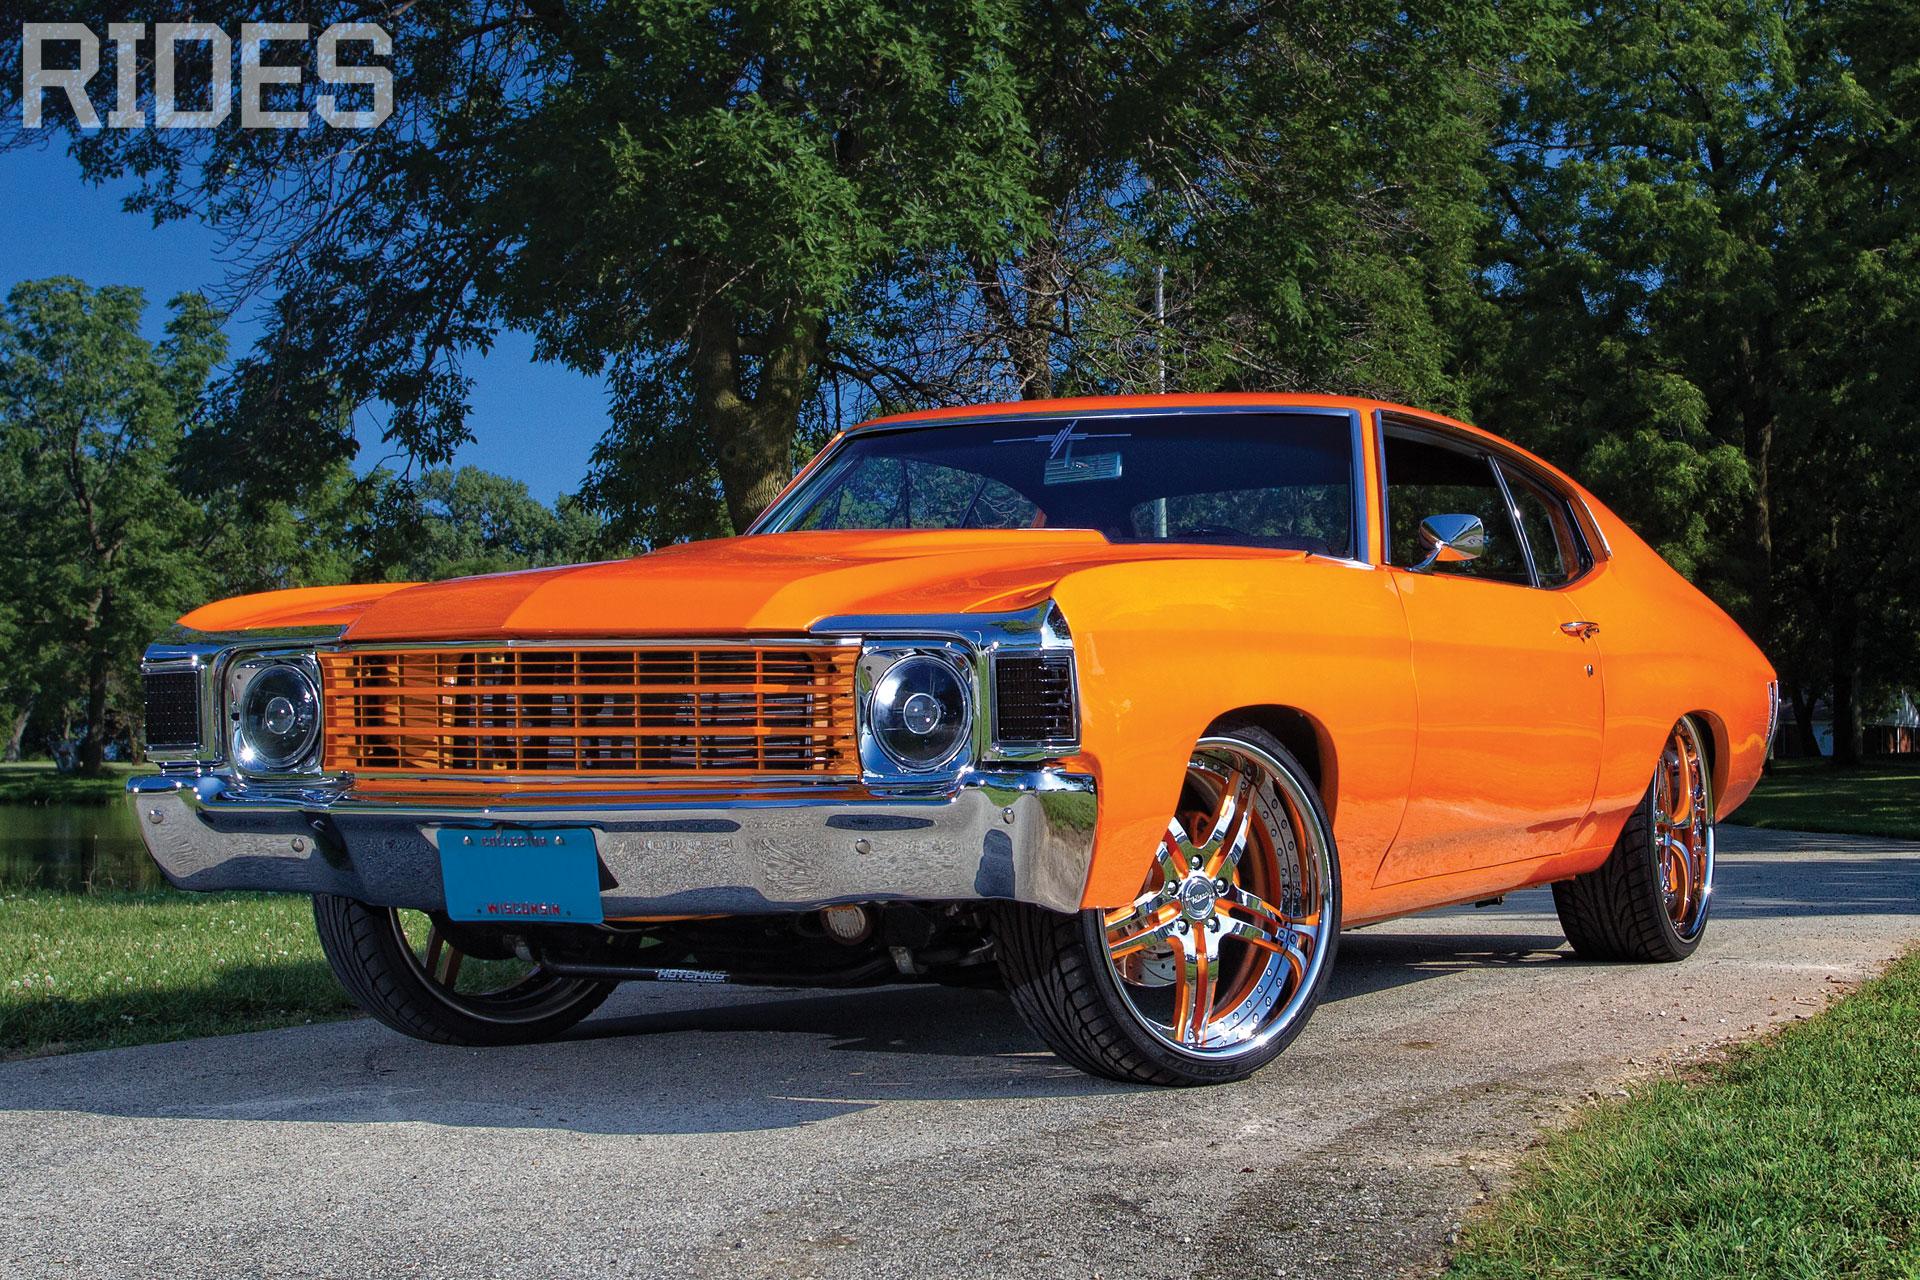 72 Chevy Chevelle Rides Magazine